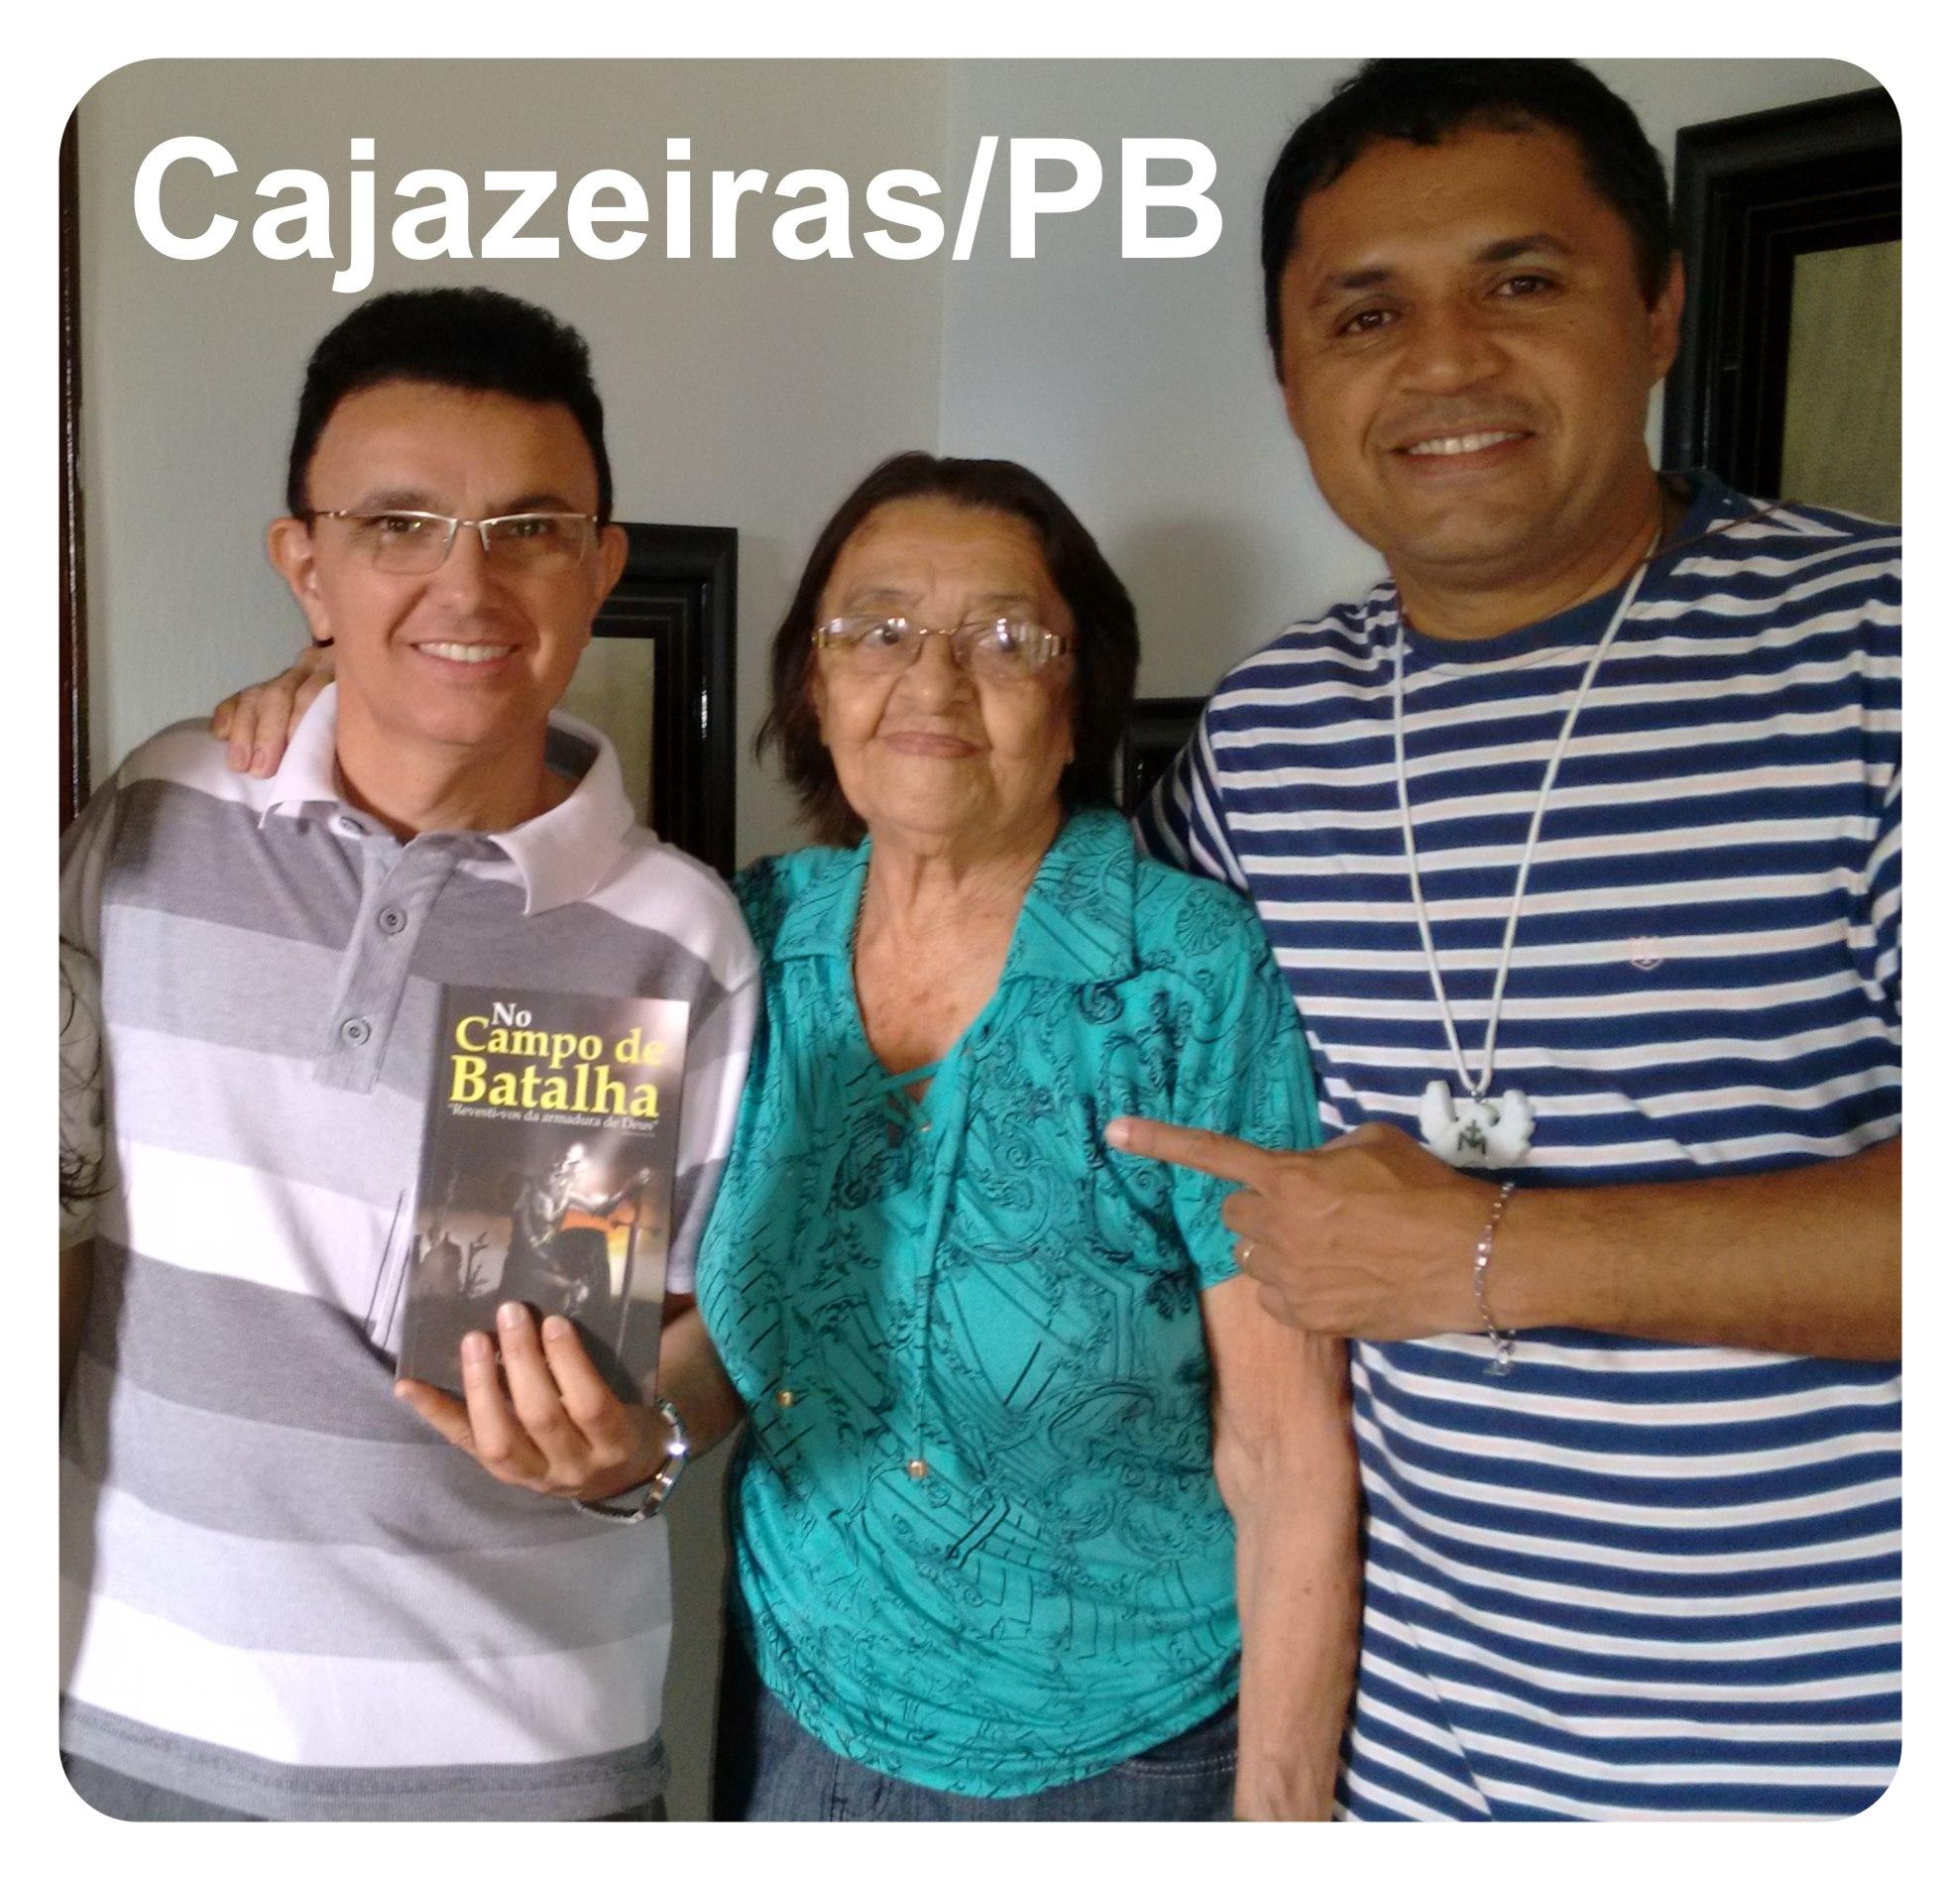 Cajazeiras/PB